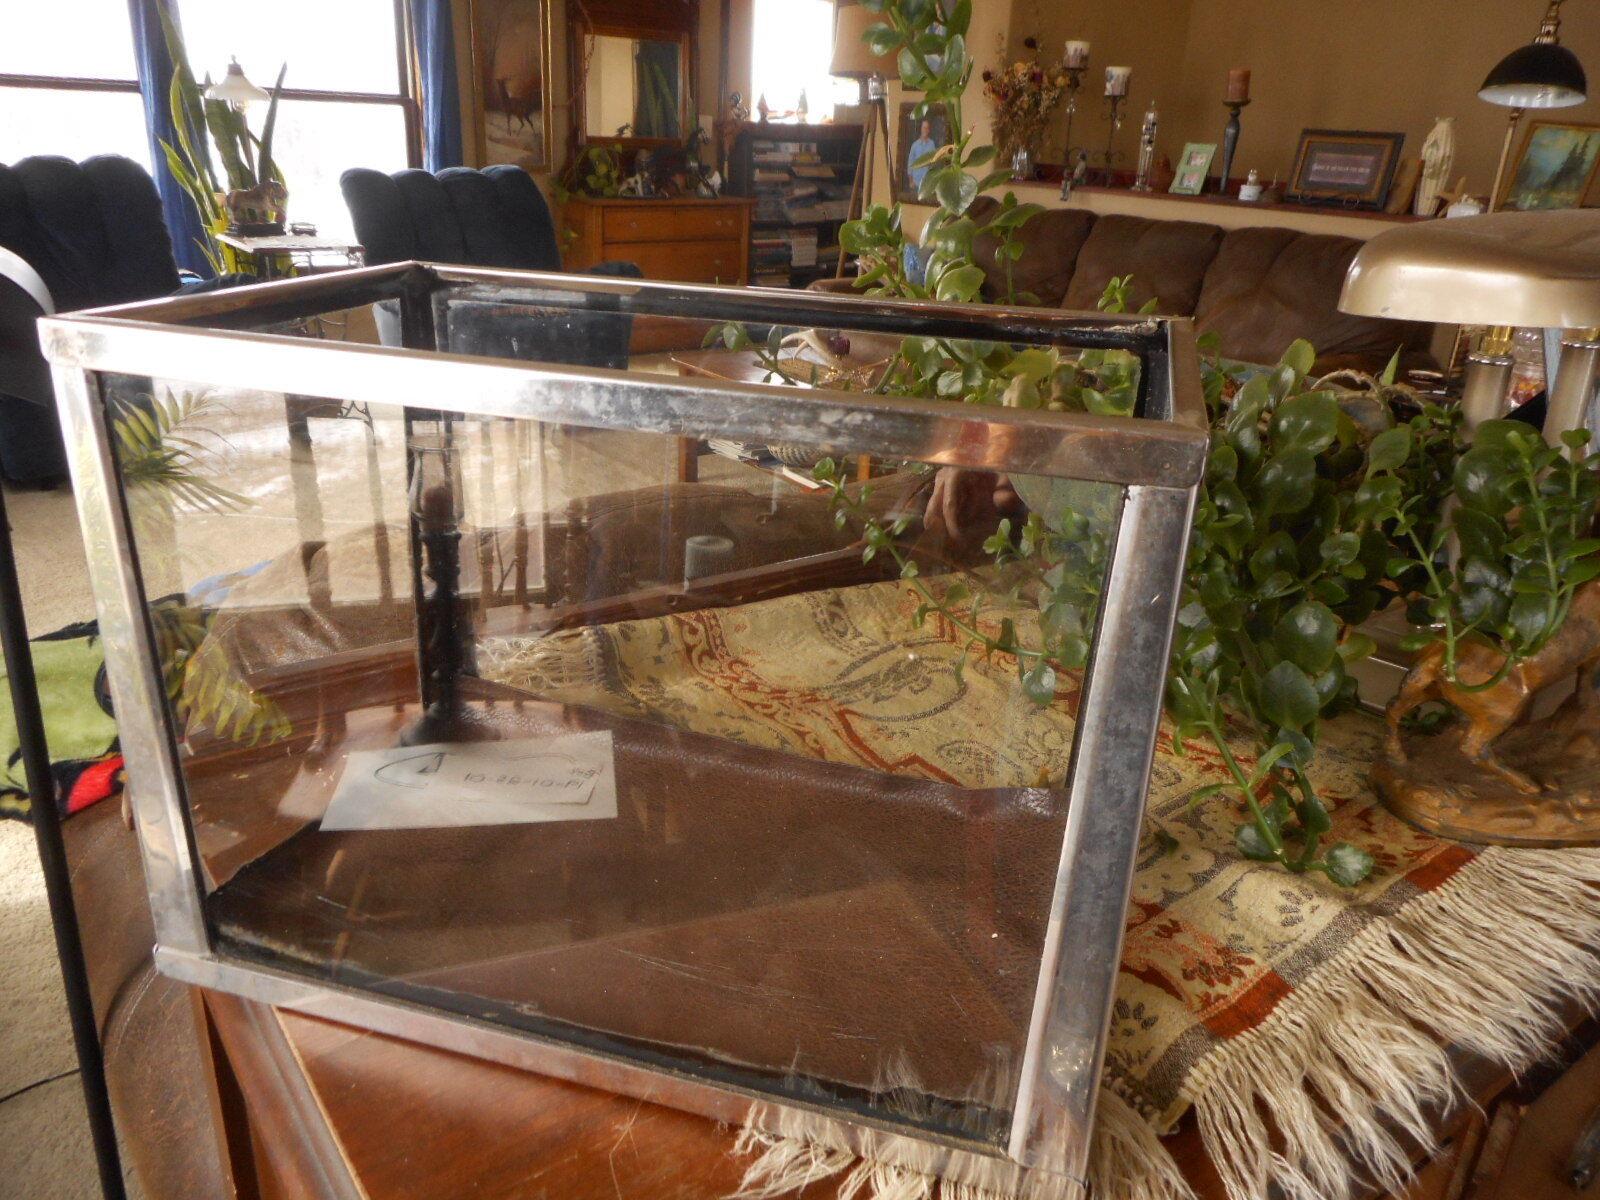 Aquarium Fish Tank Vintage Stainless Steel Reptile Terrarium Terrarium Terrarium Small Flea Market 73e0b2